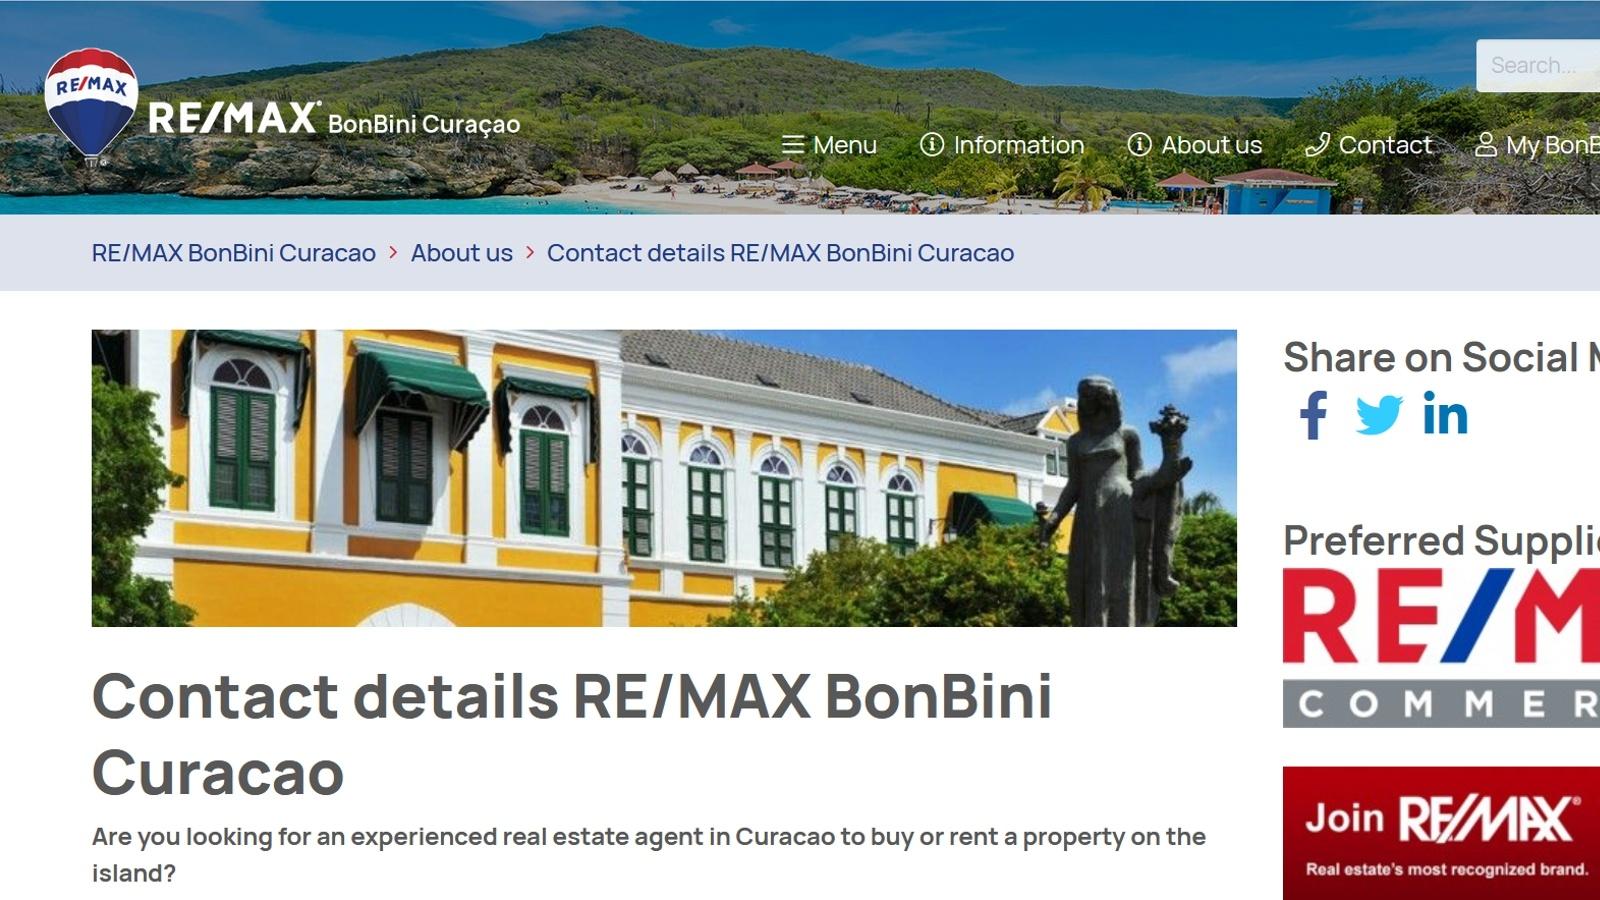 Curacao REMAX BonBini Slide